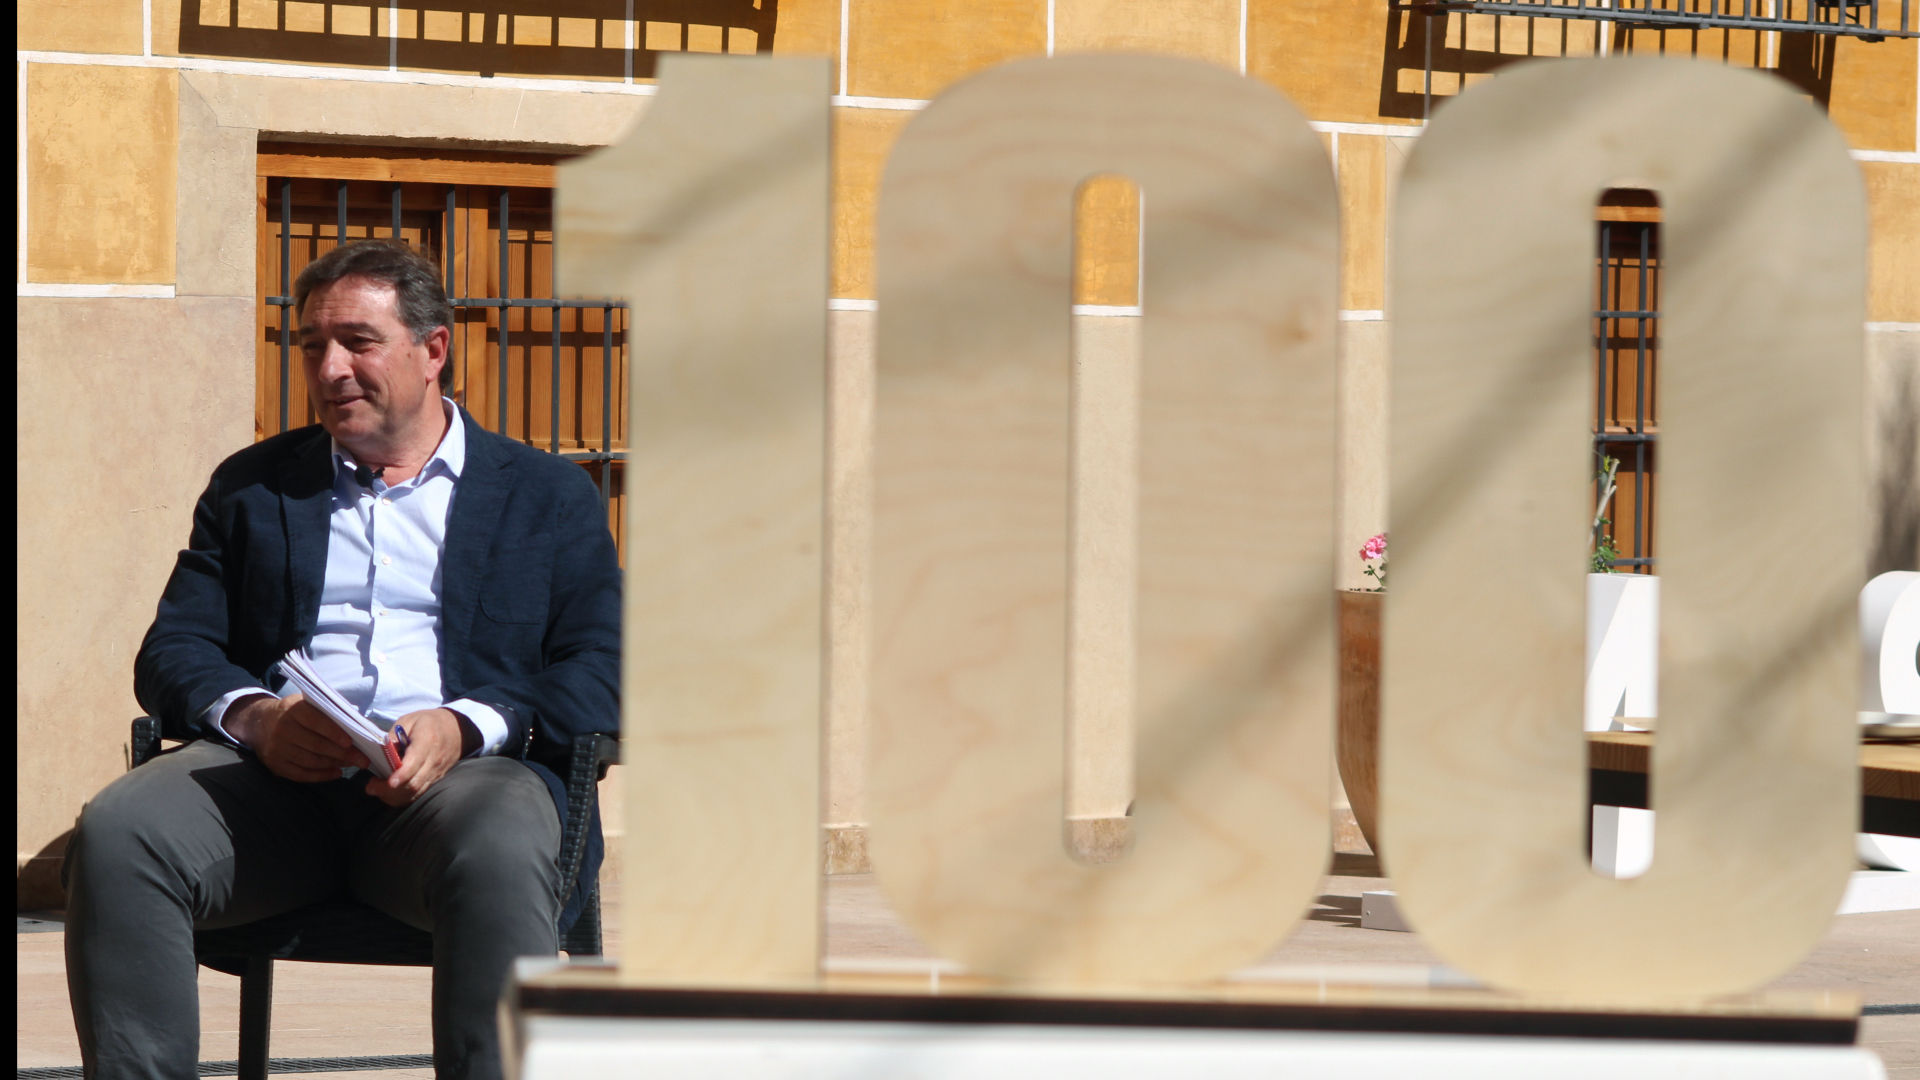 10 mar - Salva Gomar hace balance de 100 días en presidencia FFCV